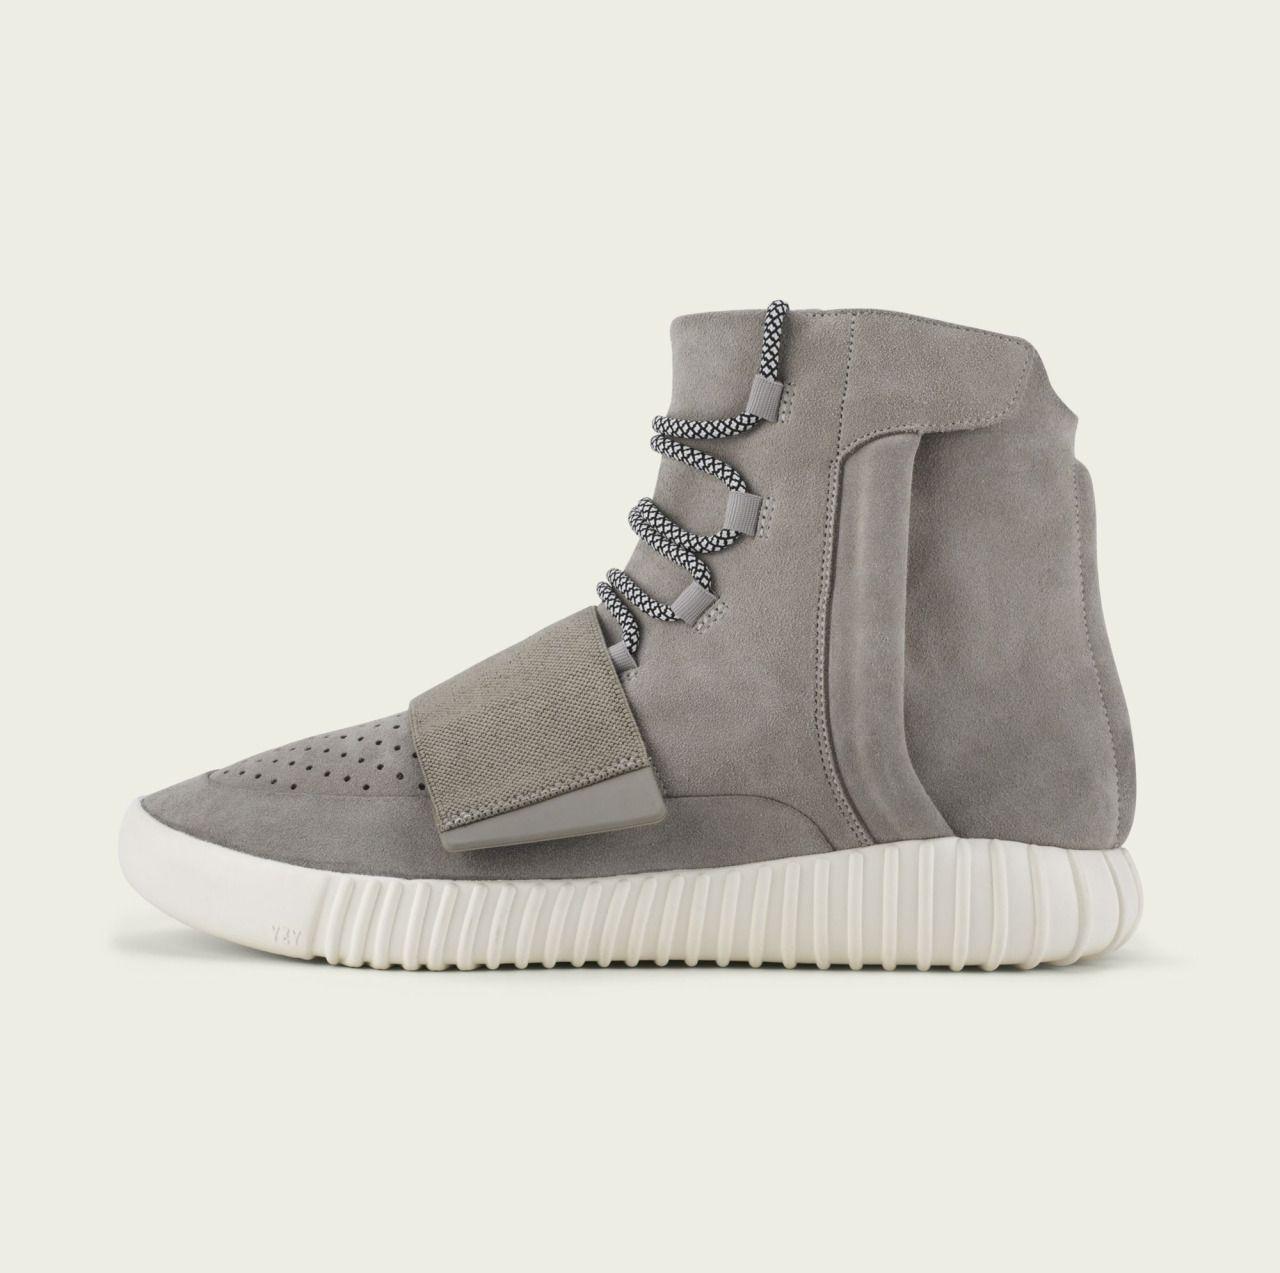 yeezy adidas schuhe original